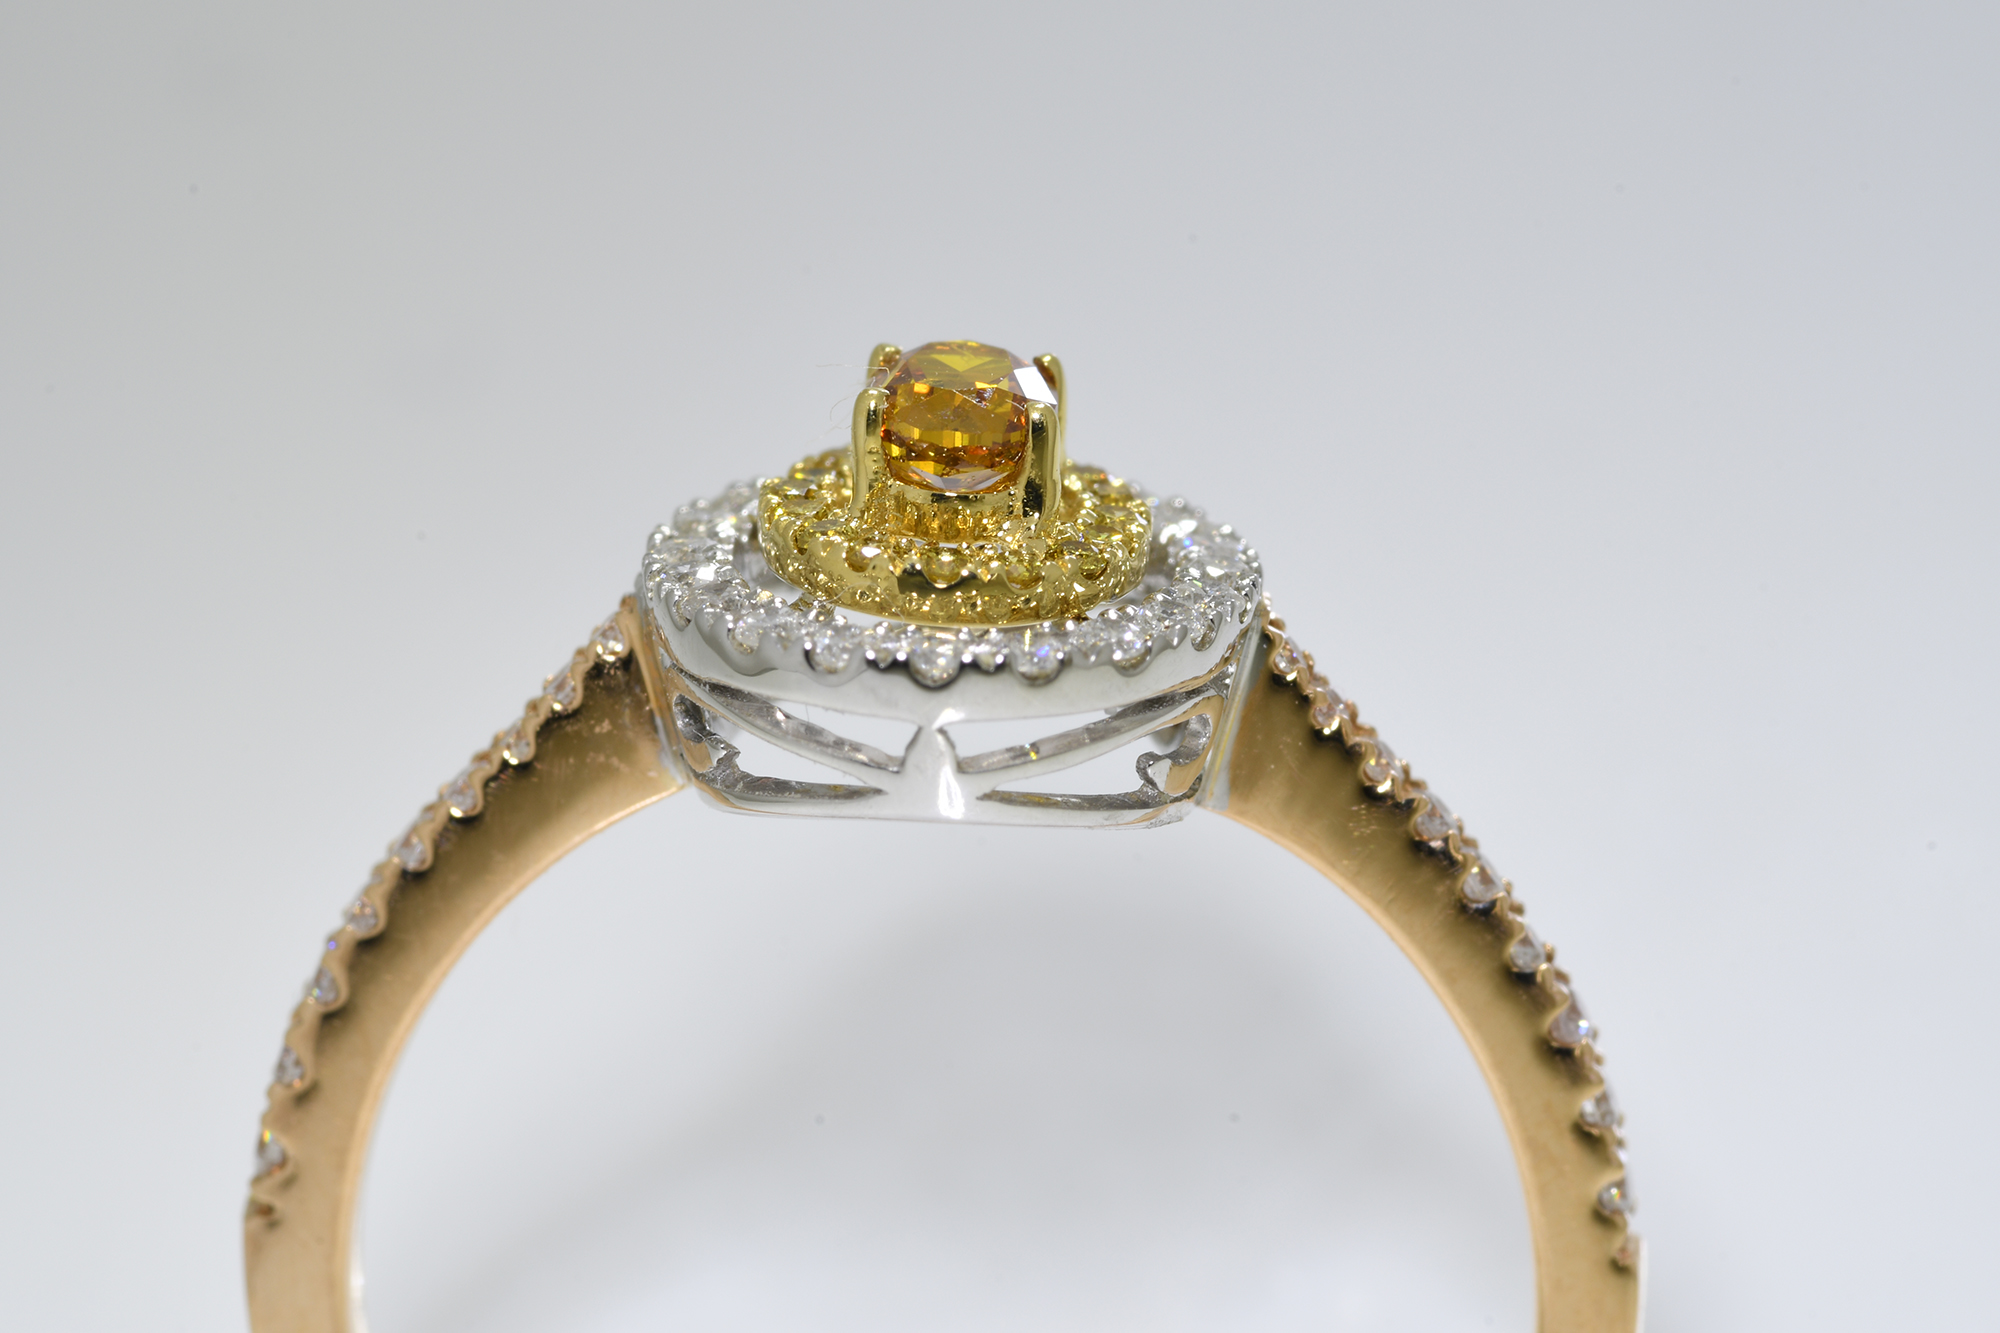 Oval Cognac Diamond Ring - Image 4 of 4